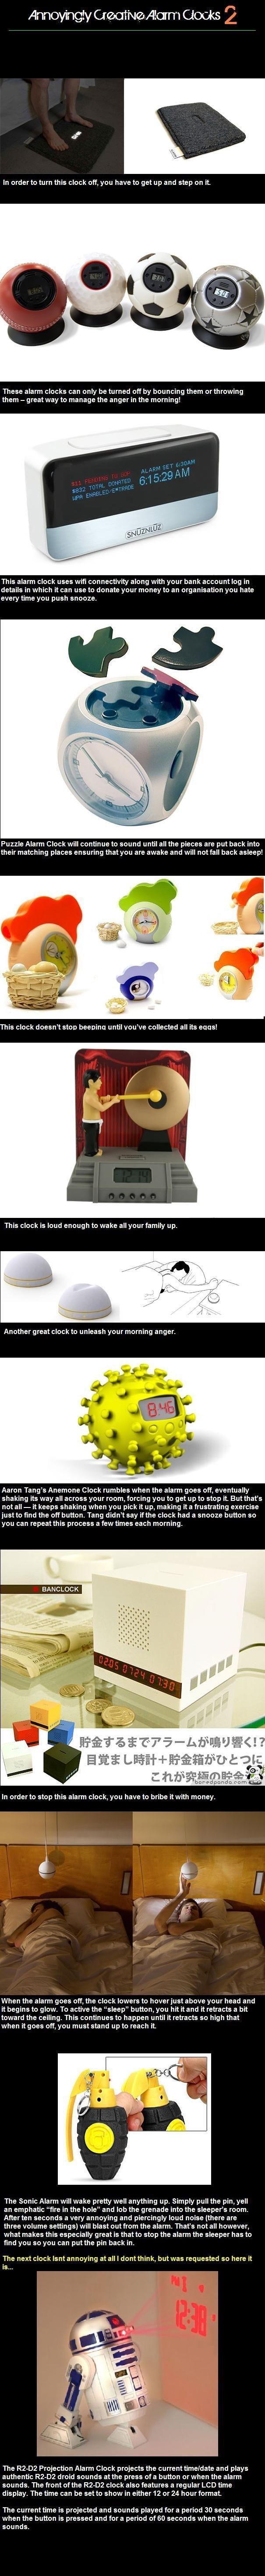 Annoyingly Creative Alarm Clocks 2. Part 1:<br /> funnyjunk.com/funny_pictures/314653/Annoyingly+Creative+Alarm+Clocks/<br /> Also:<br /> funn